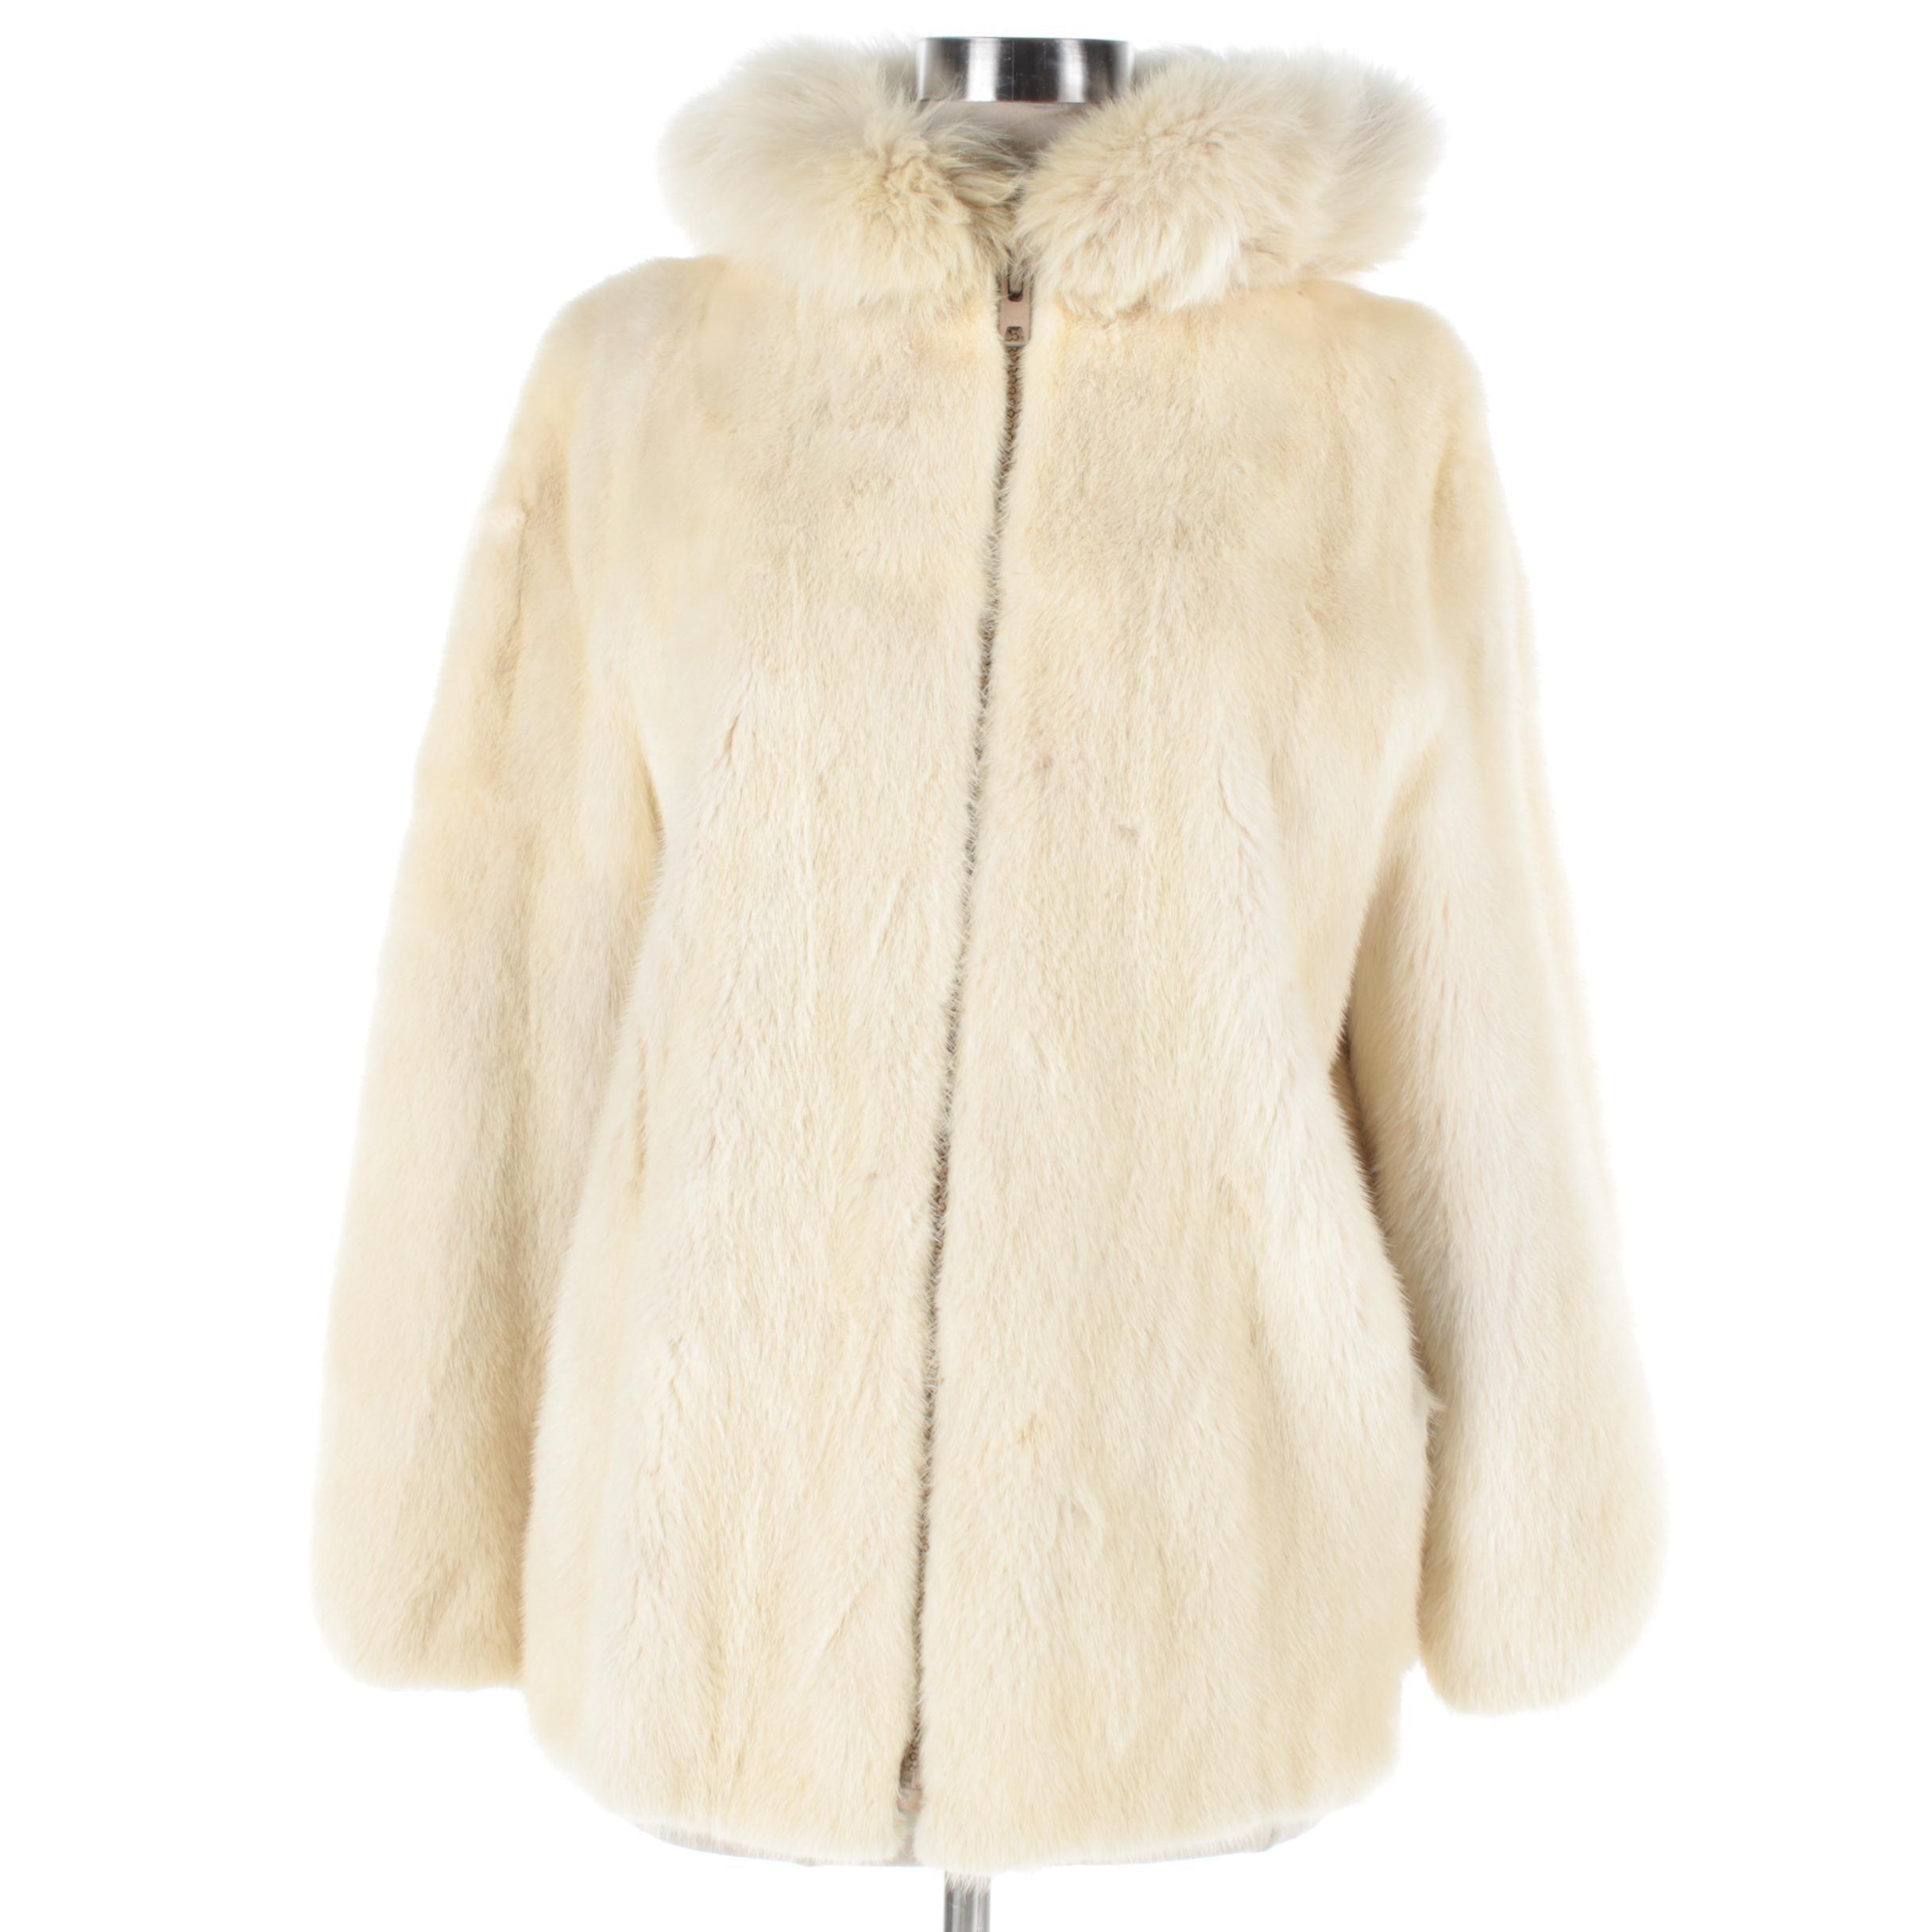 Women's Vintage Platinum Mink Fur Jacket with Fox Fur Trim